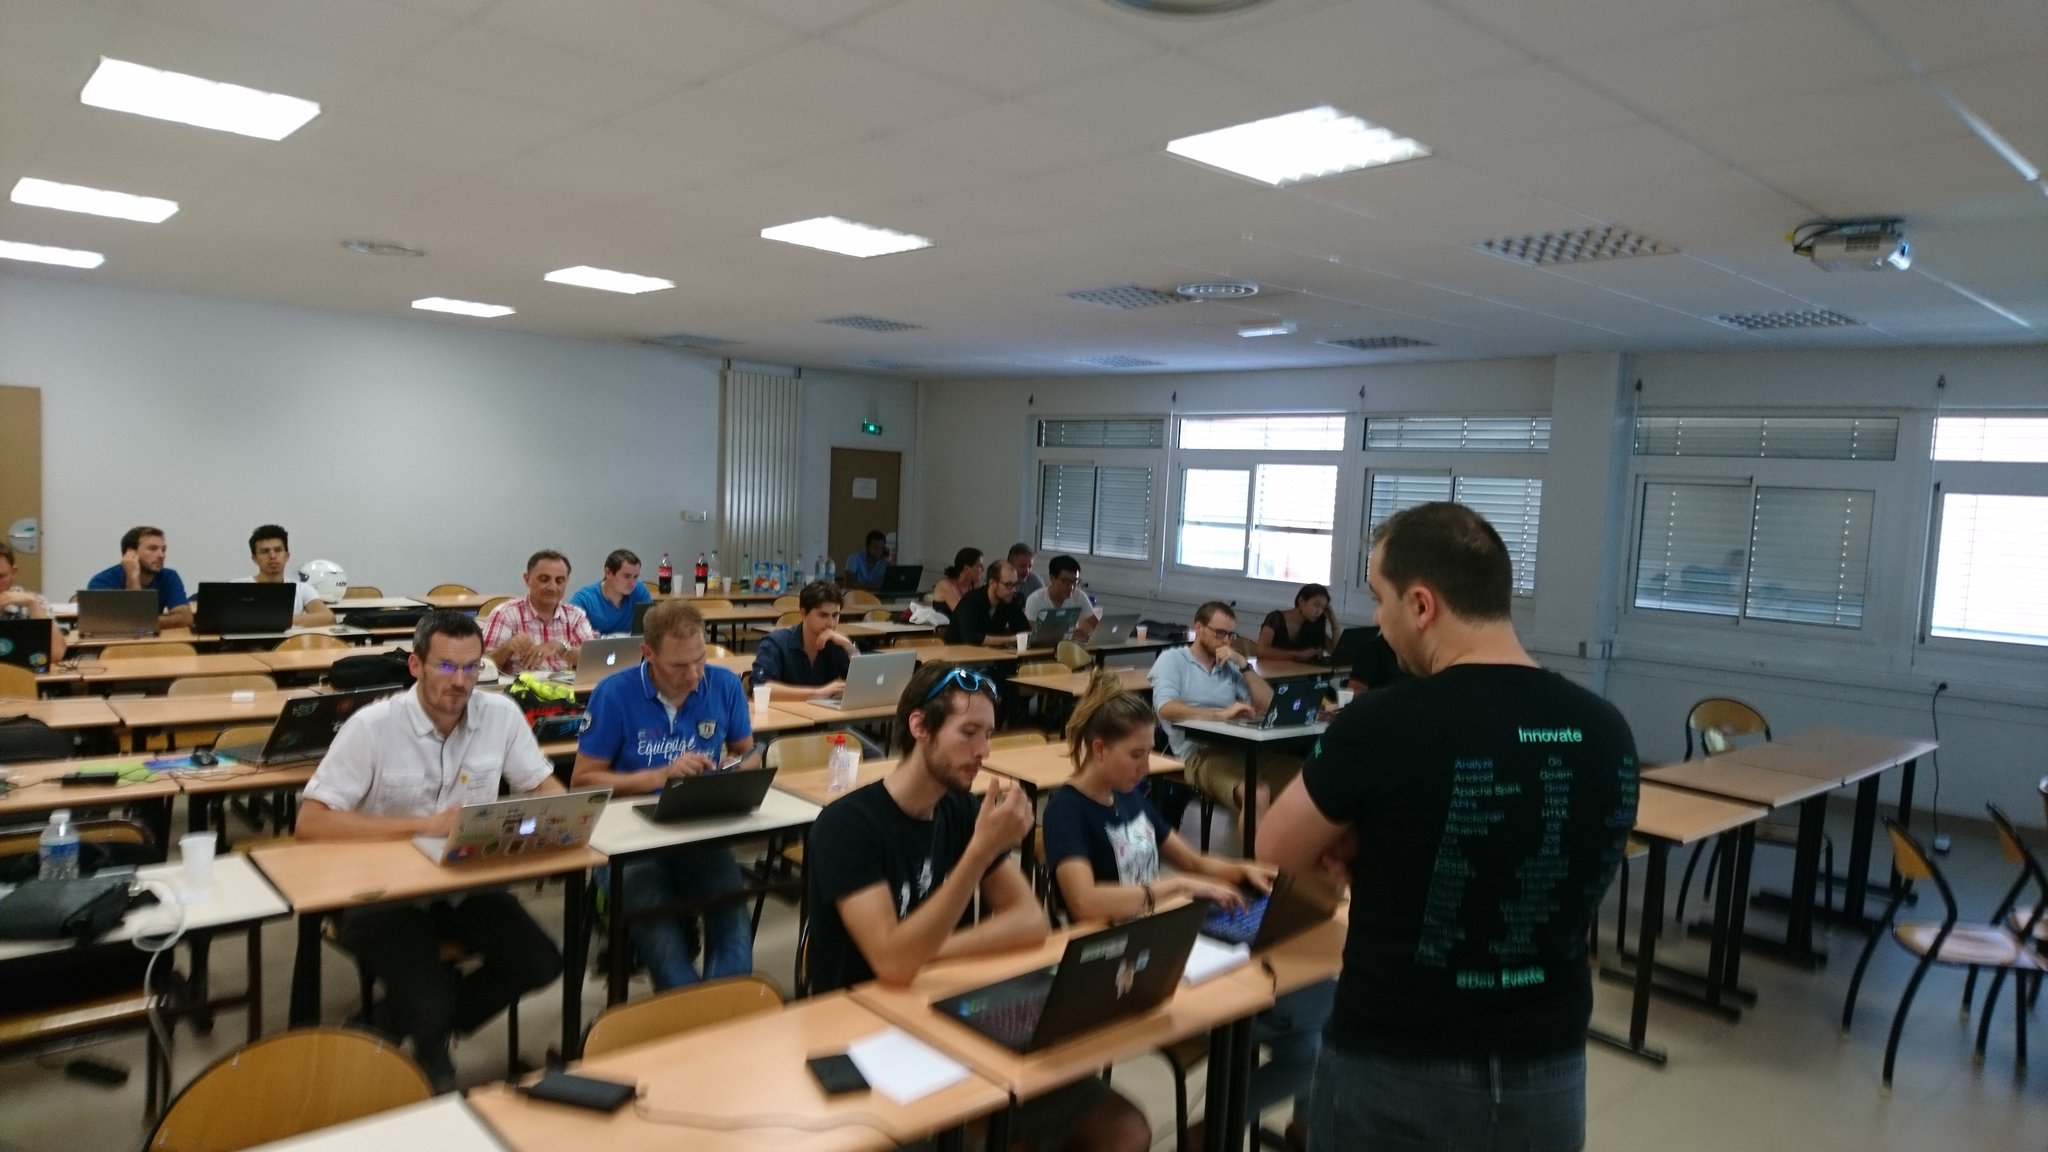 Dernière session #SophiaConf2017 workshop #blockchain #smartcontract #Hyperledger avec @zamrokk @IBM https://t.co/ff9jTktvrp